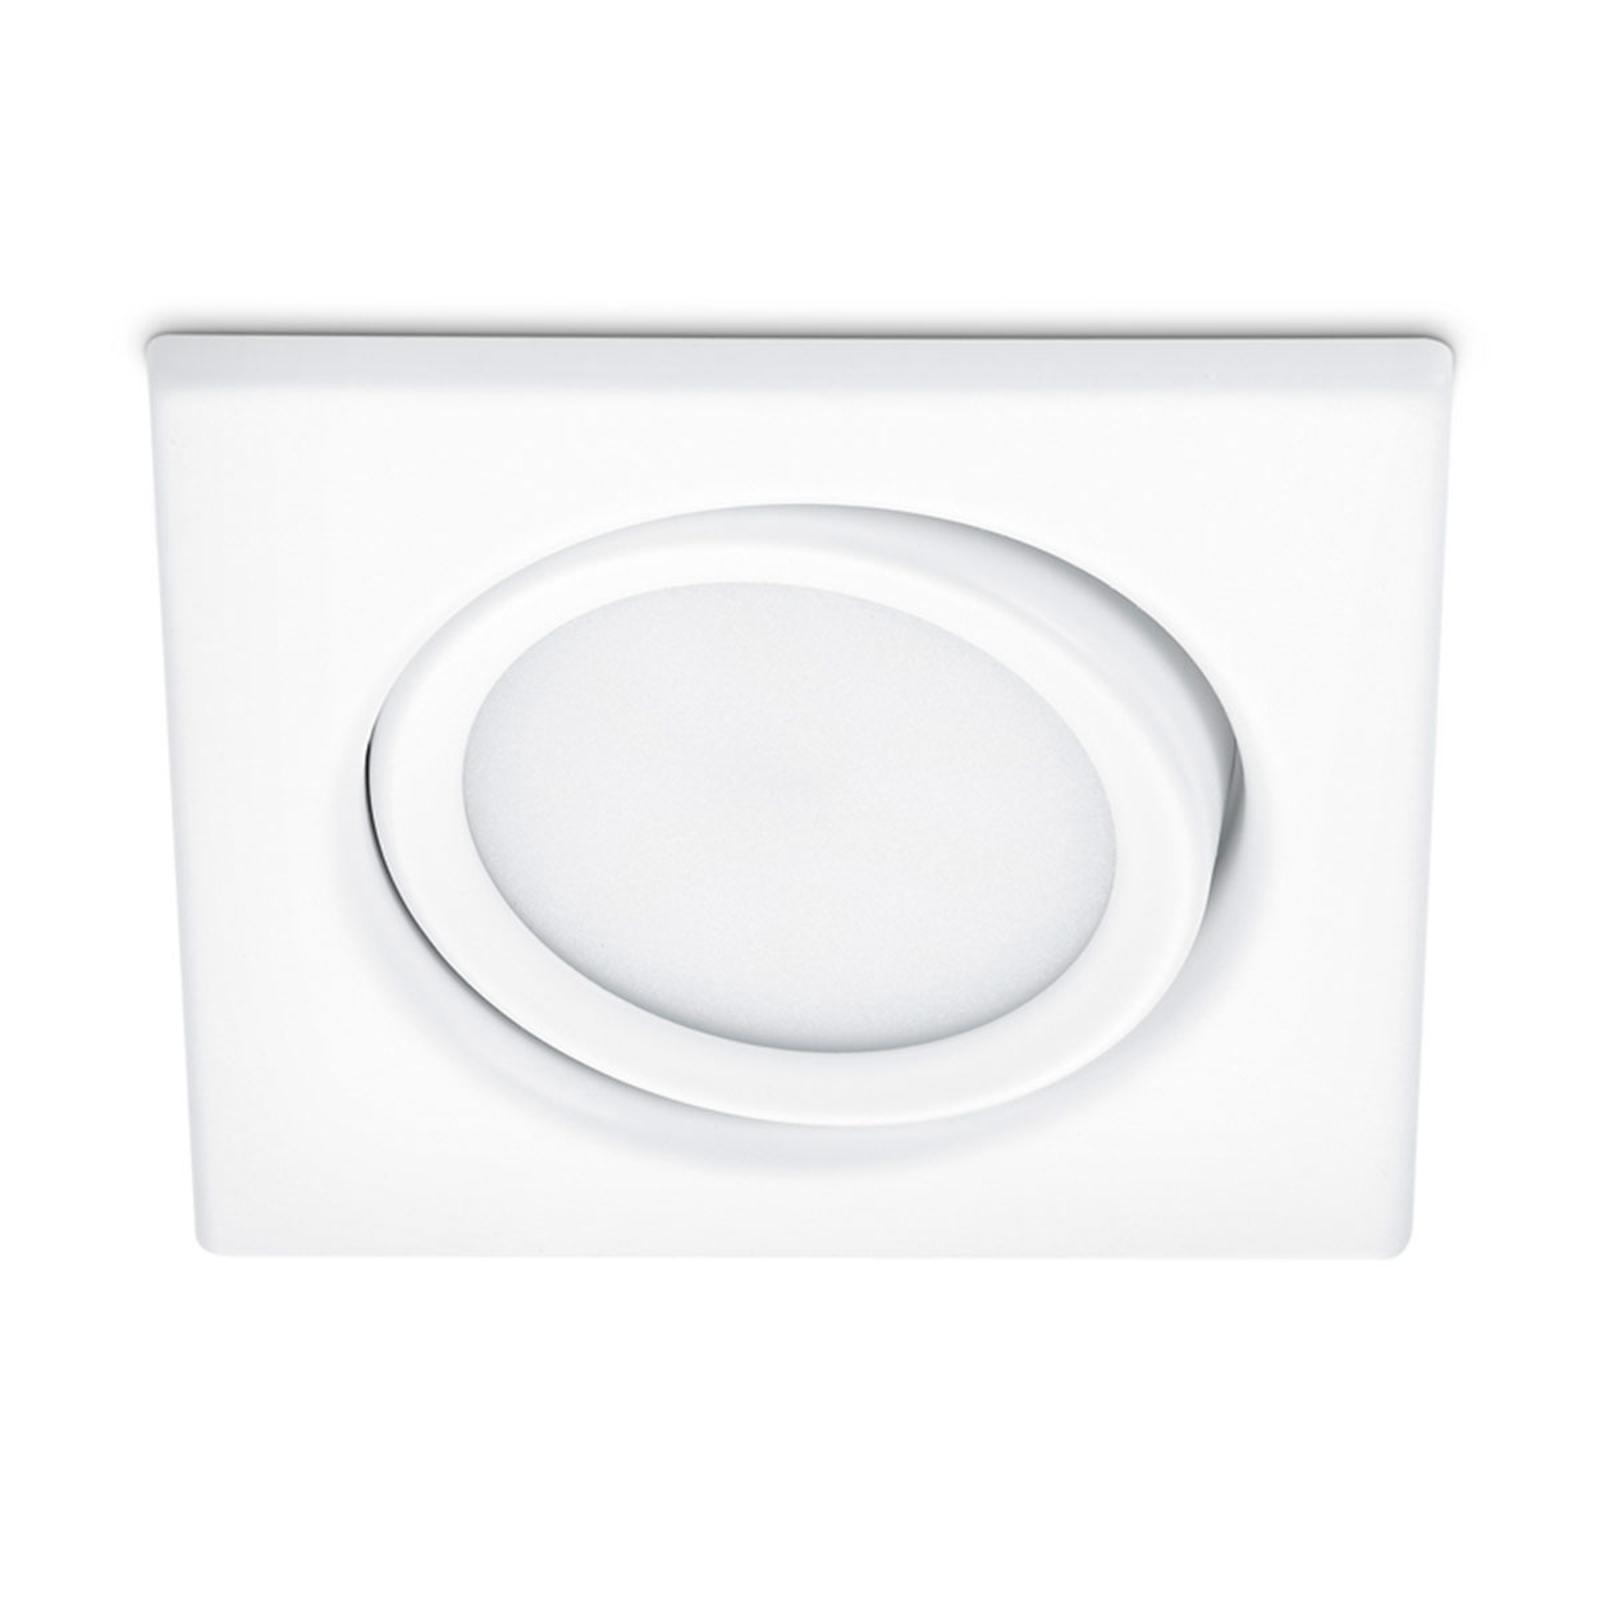 Schwenkbarer LED-Einbaustrahler Rila in Weiß